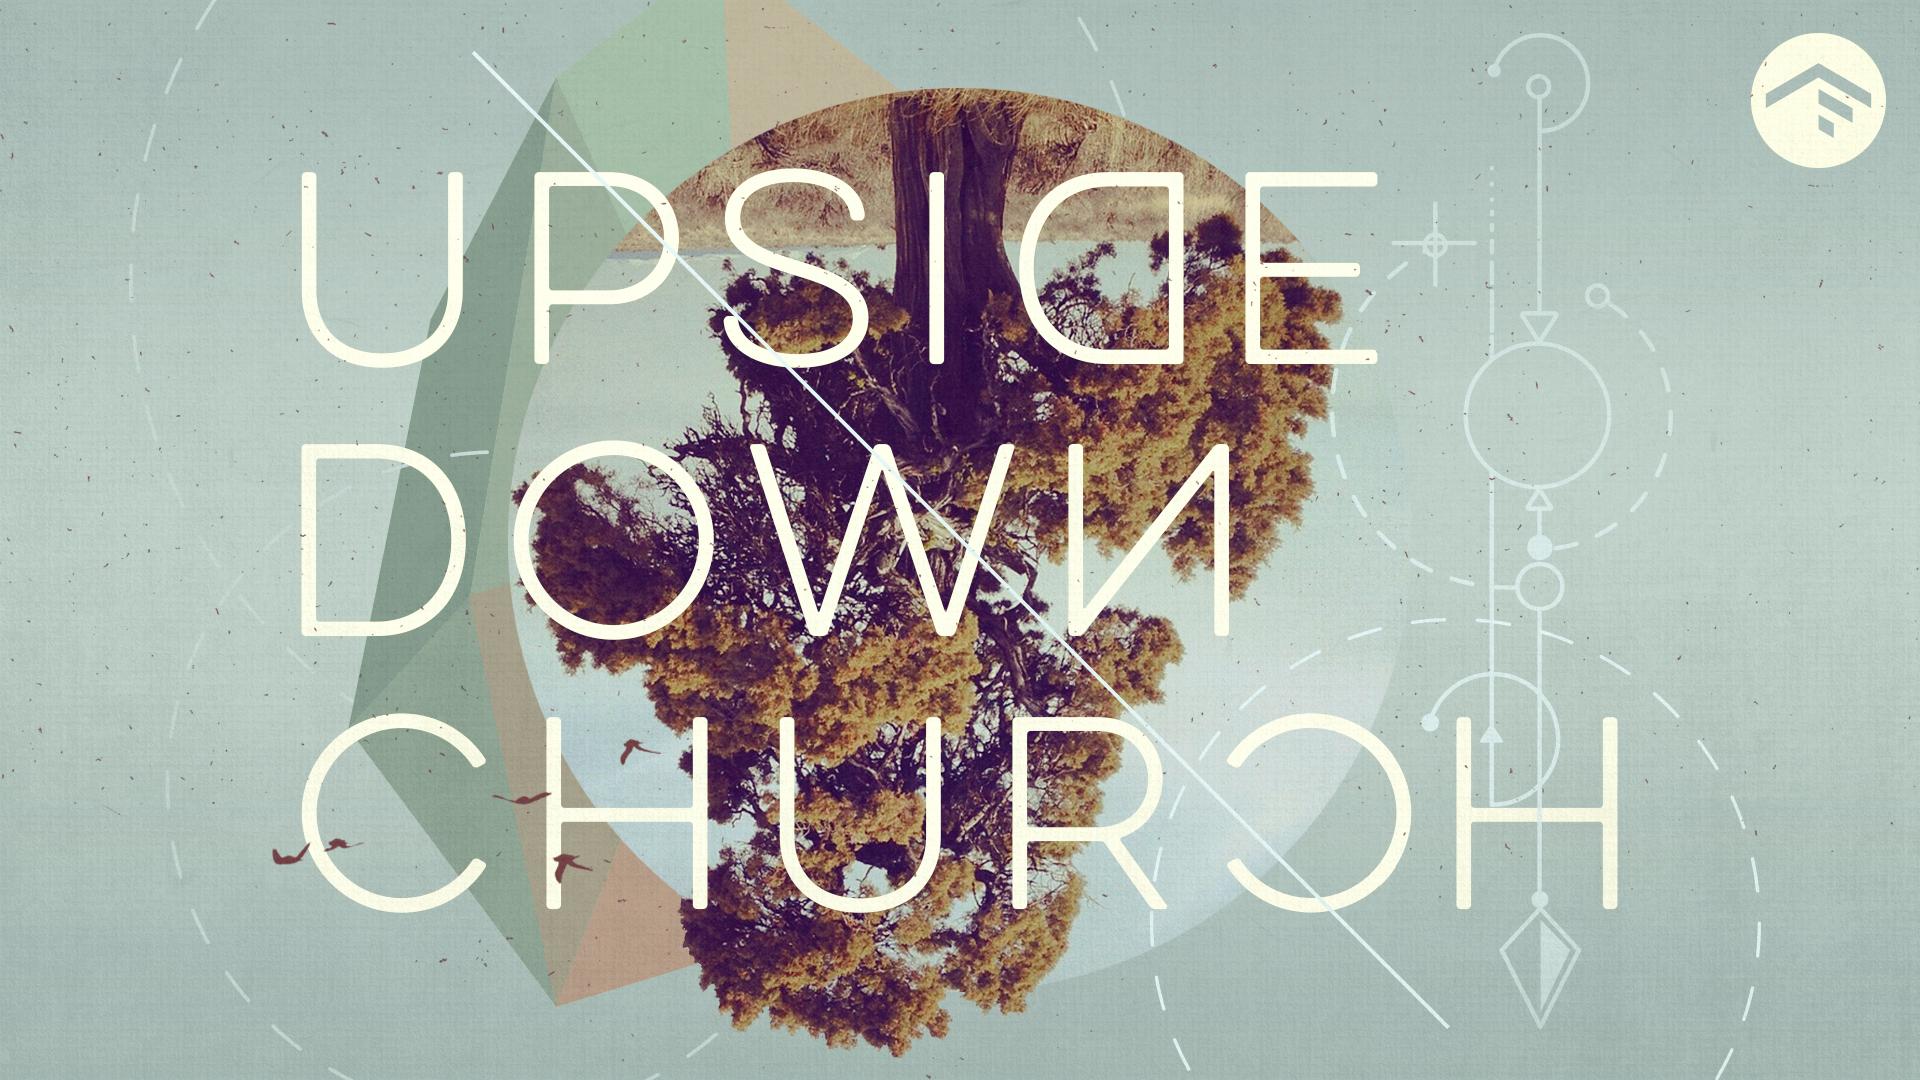 Upside-Down Church_Title (1080).jpg